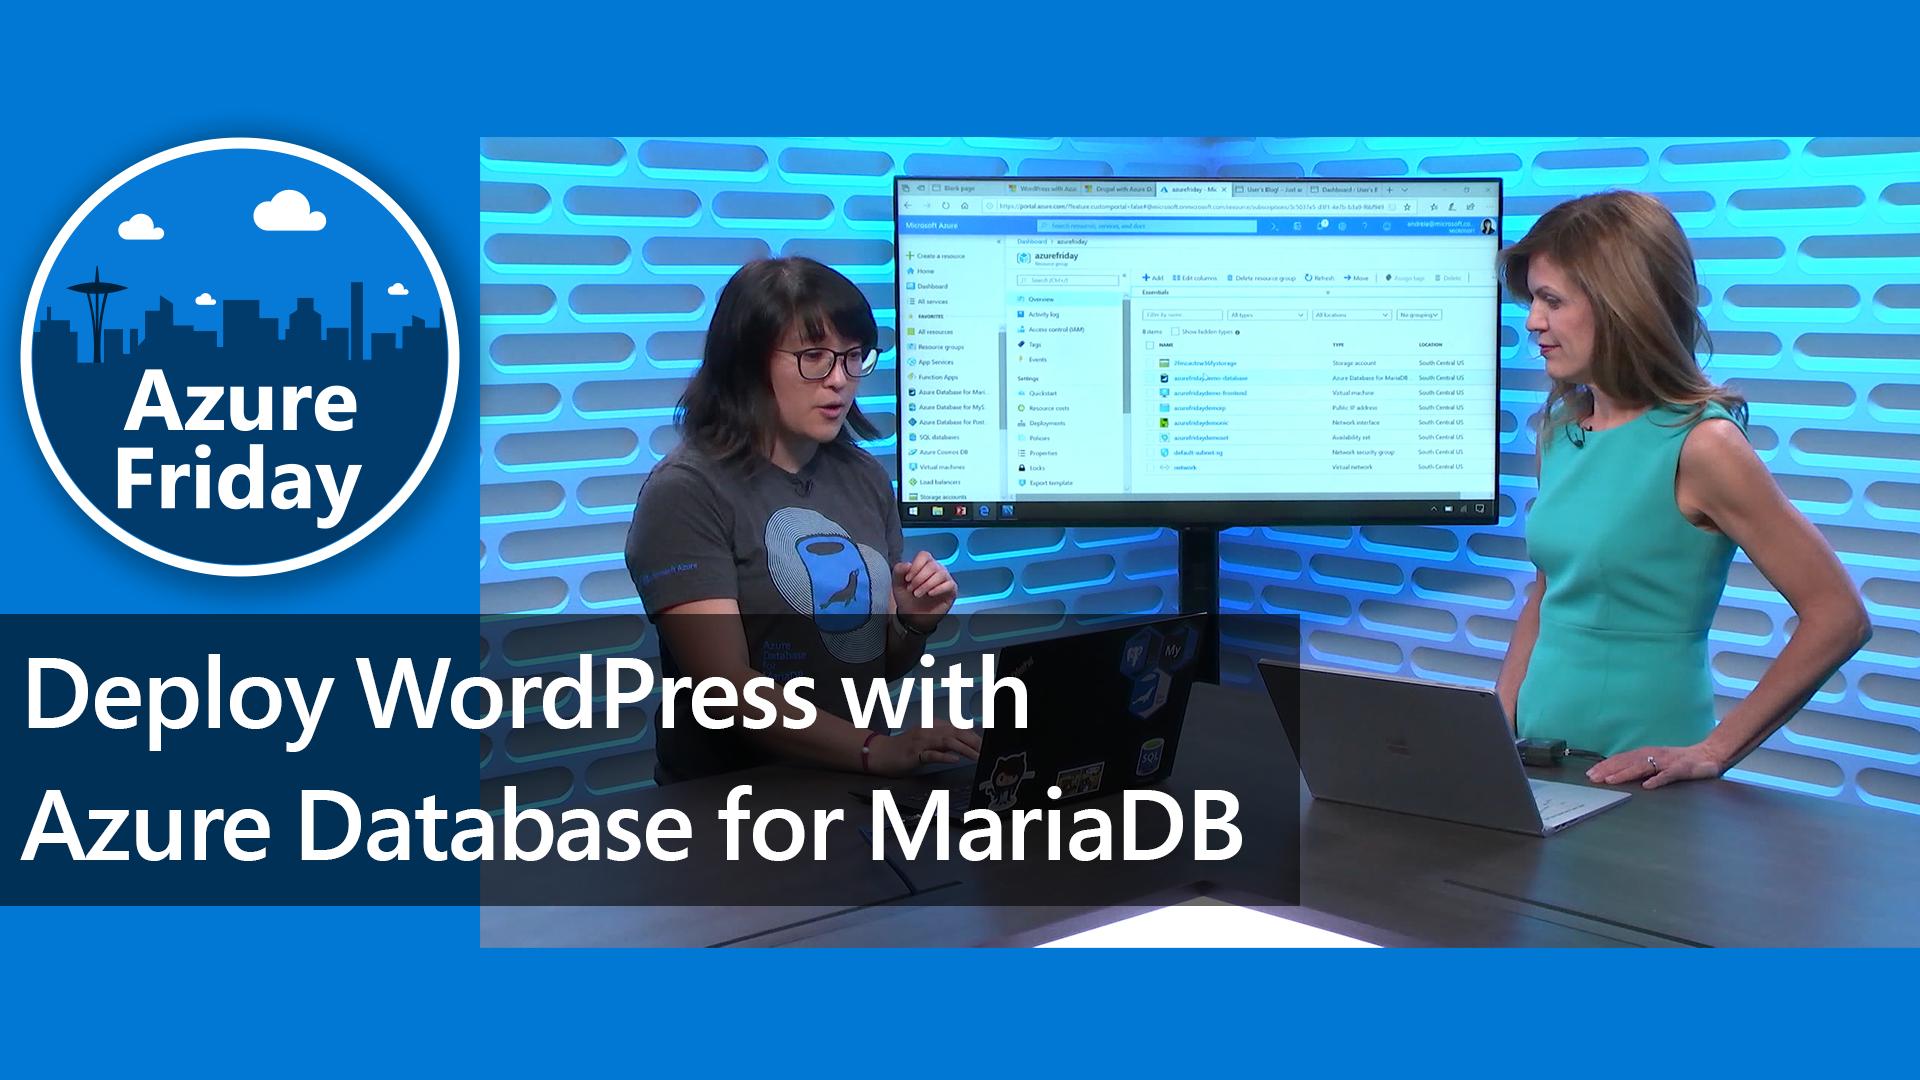 deploy wordpress with azure database for mariadb